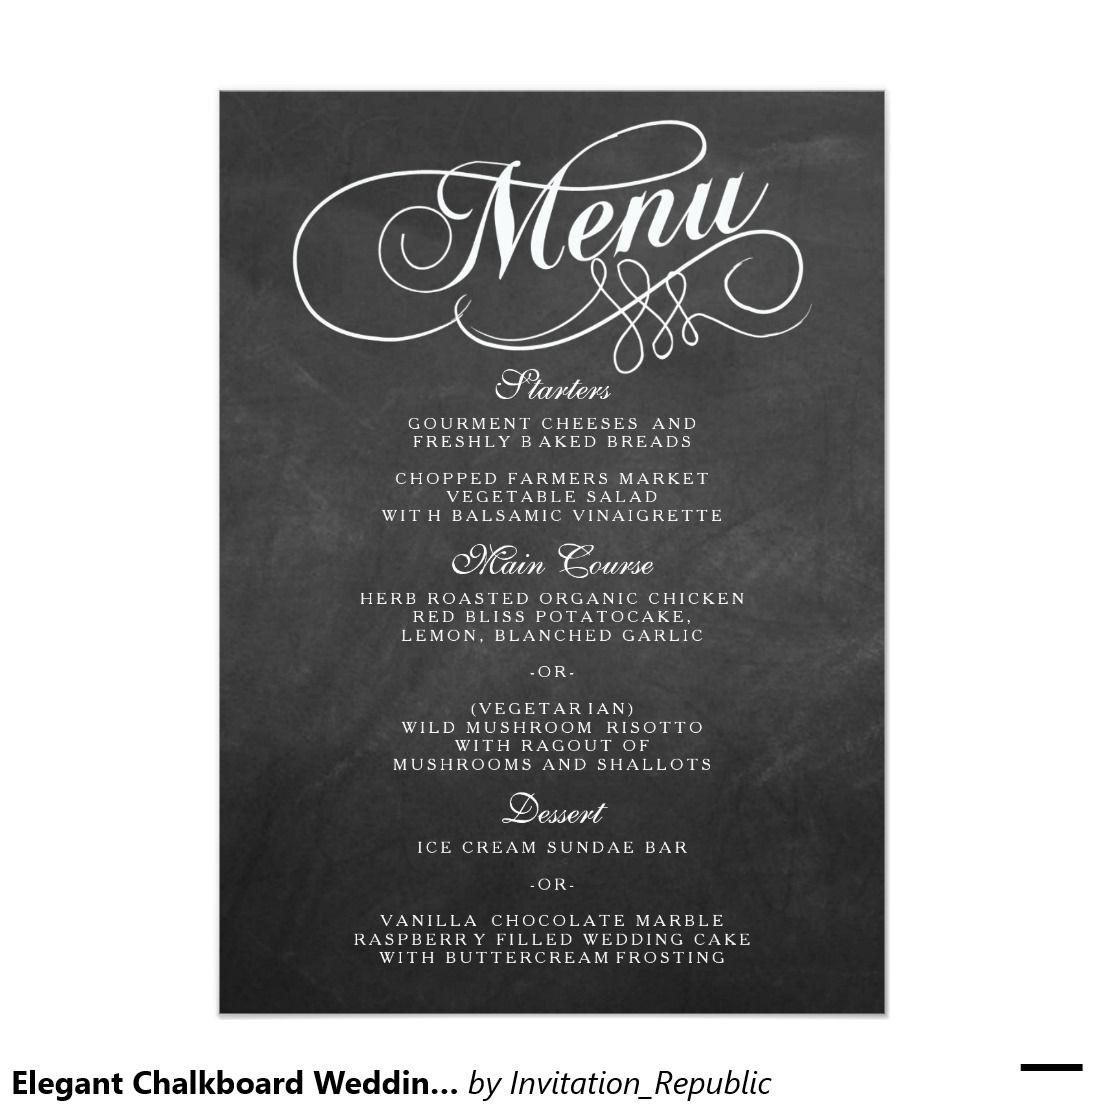 Elegant Chalkboard Wedding Menu Templates | Wedding menu template ...